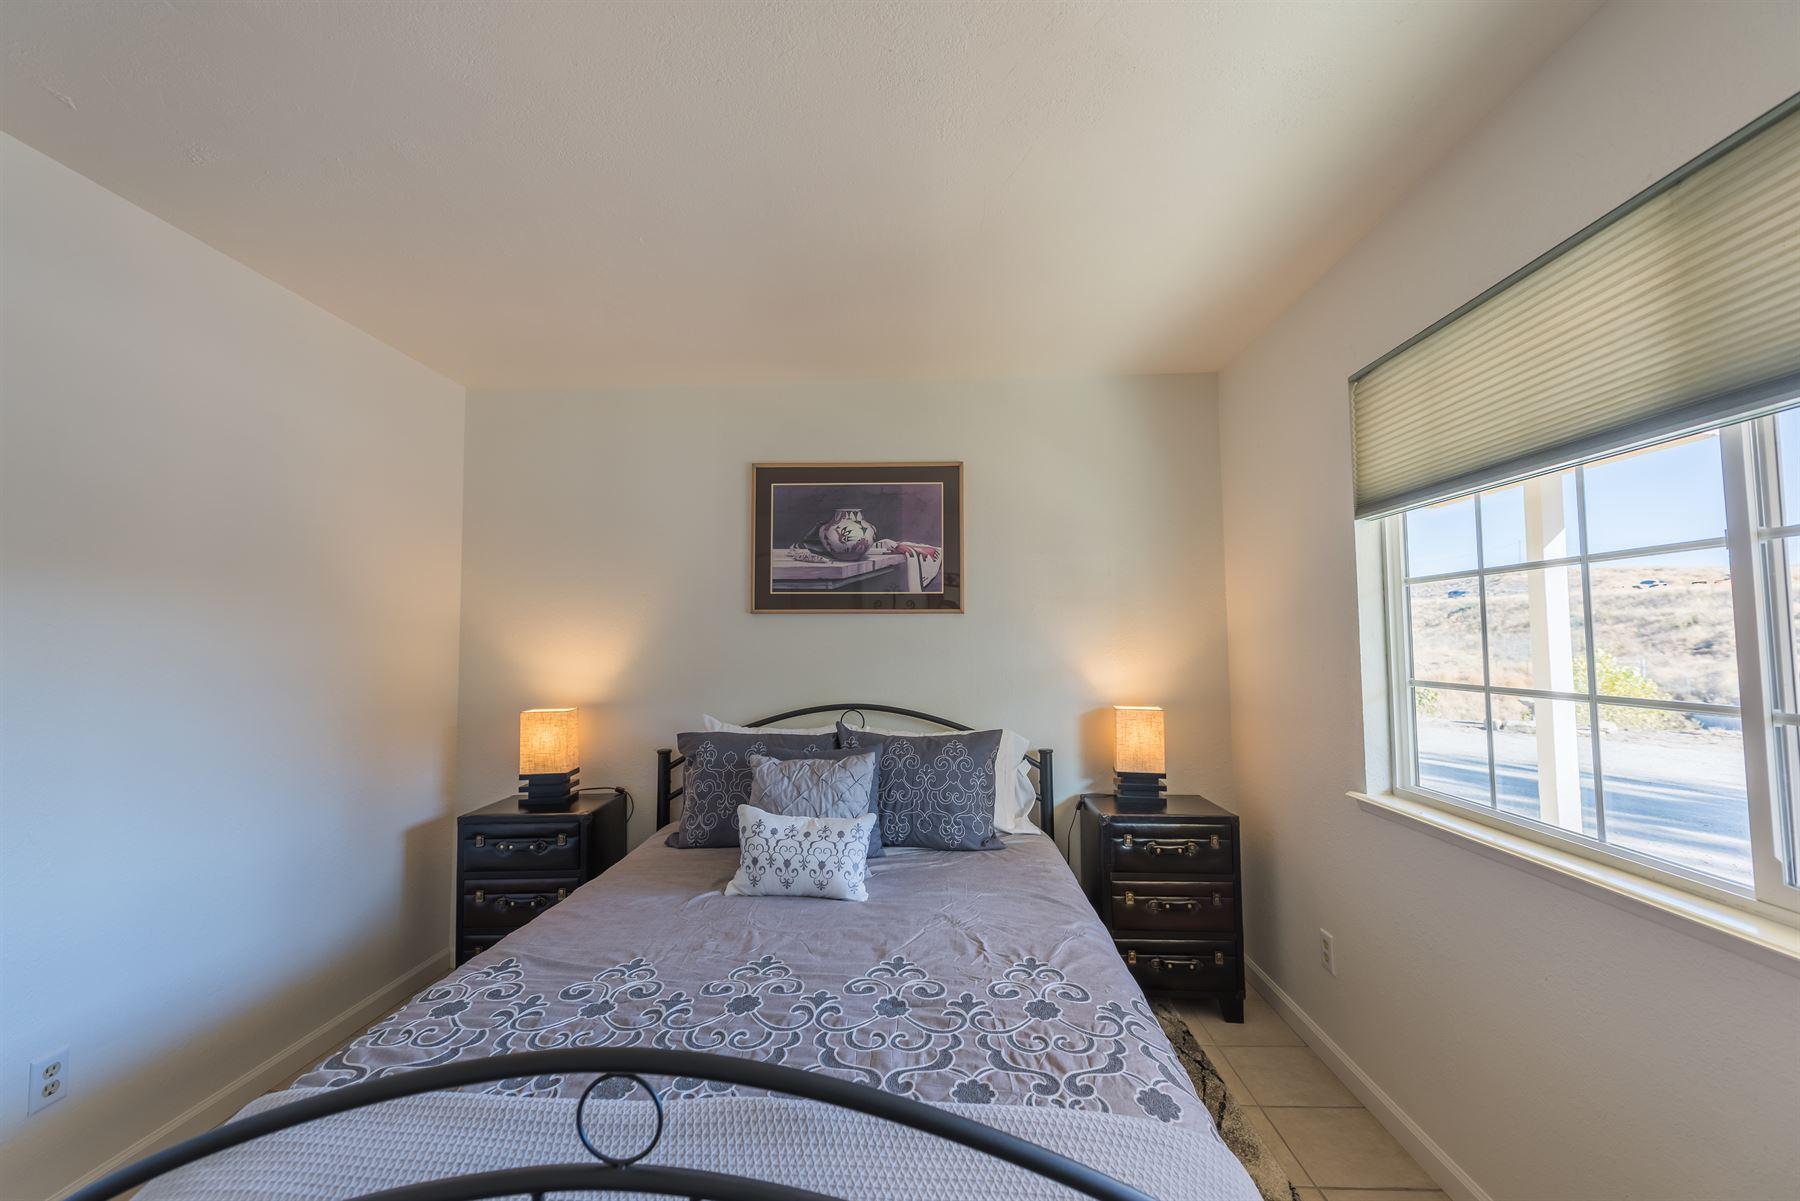 Oak Pass Ranch - Interior - Bedroom with grey linens - wide shot